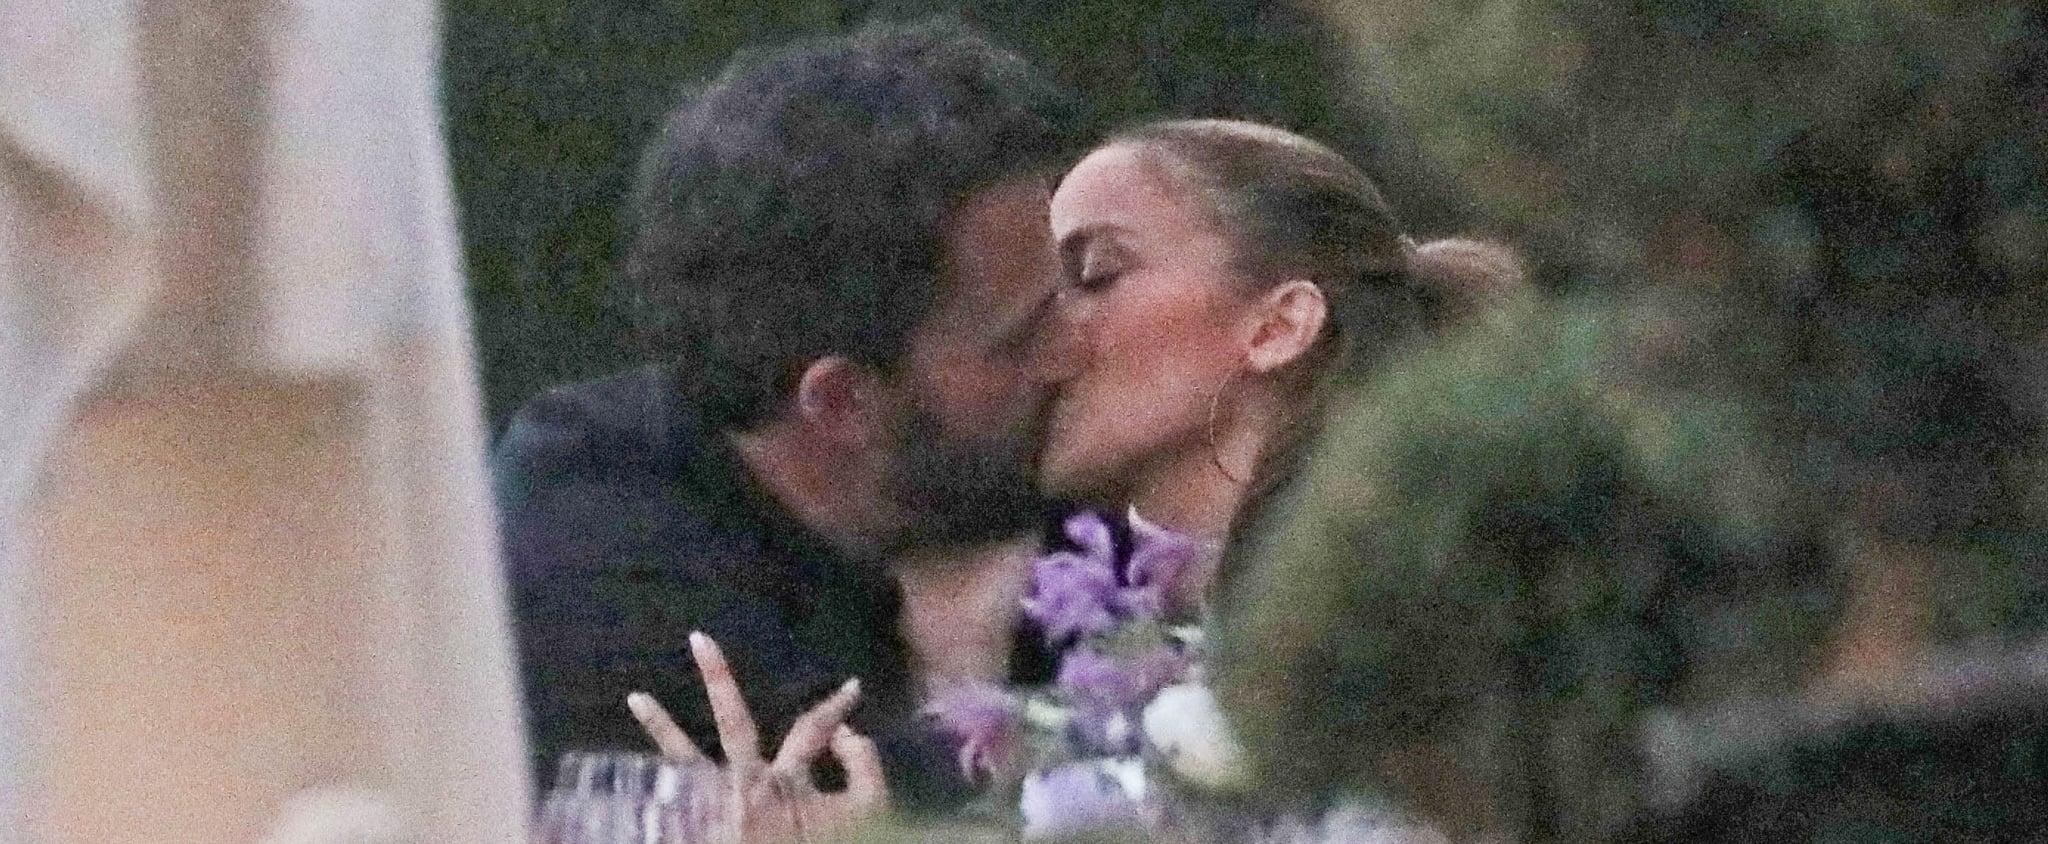 Jennifer Lopez and Ben Affleck Kissing in Malibu   Pictures